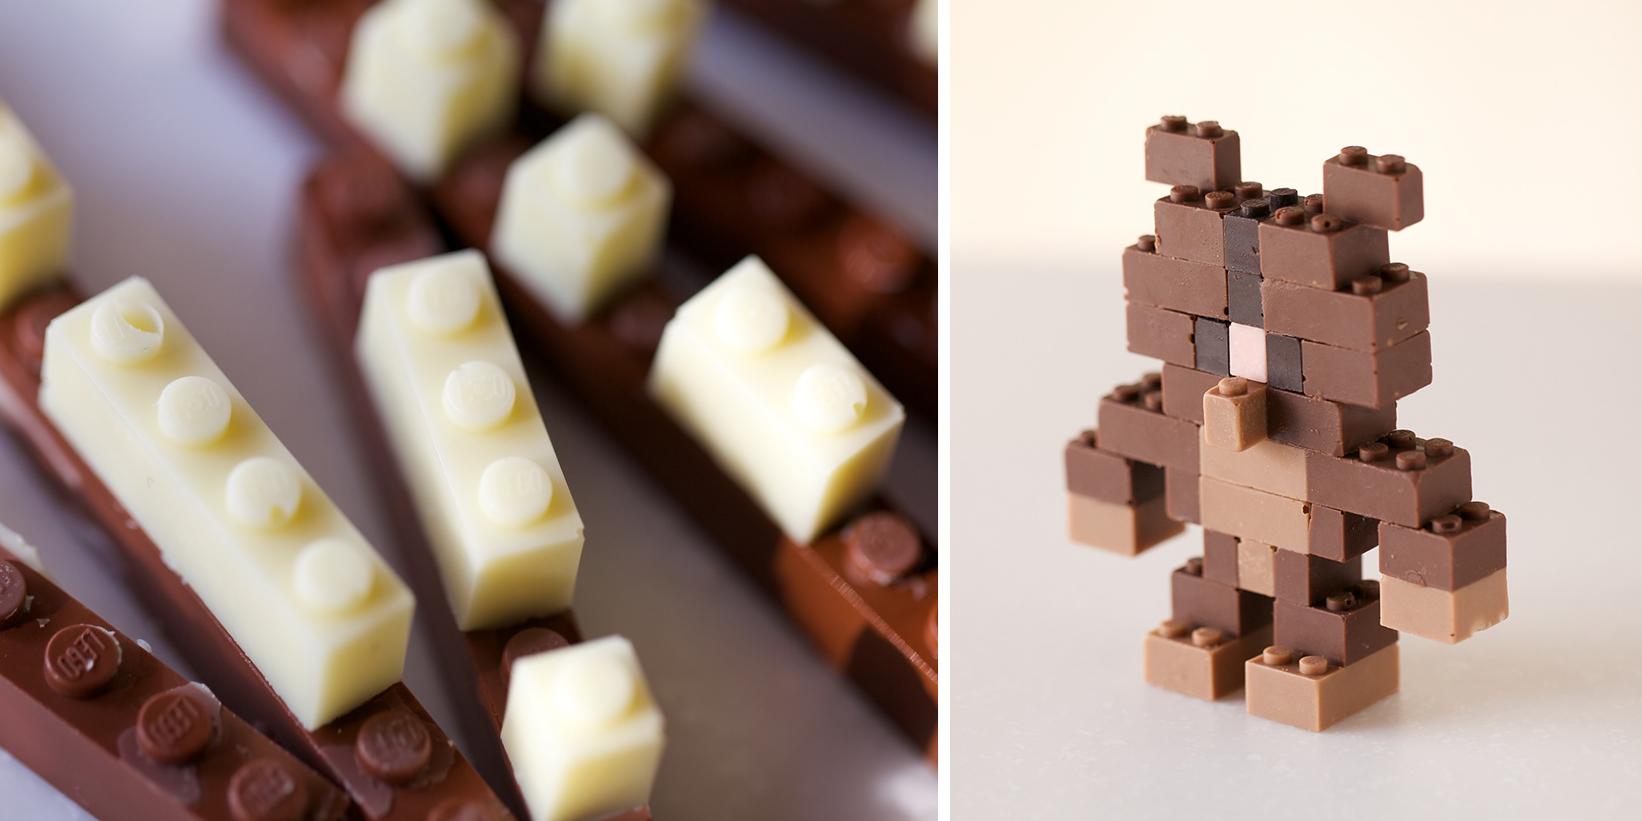 Fb Cute Wallpaper Chocolate Lego Bricks That Kids Can Actually Eat